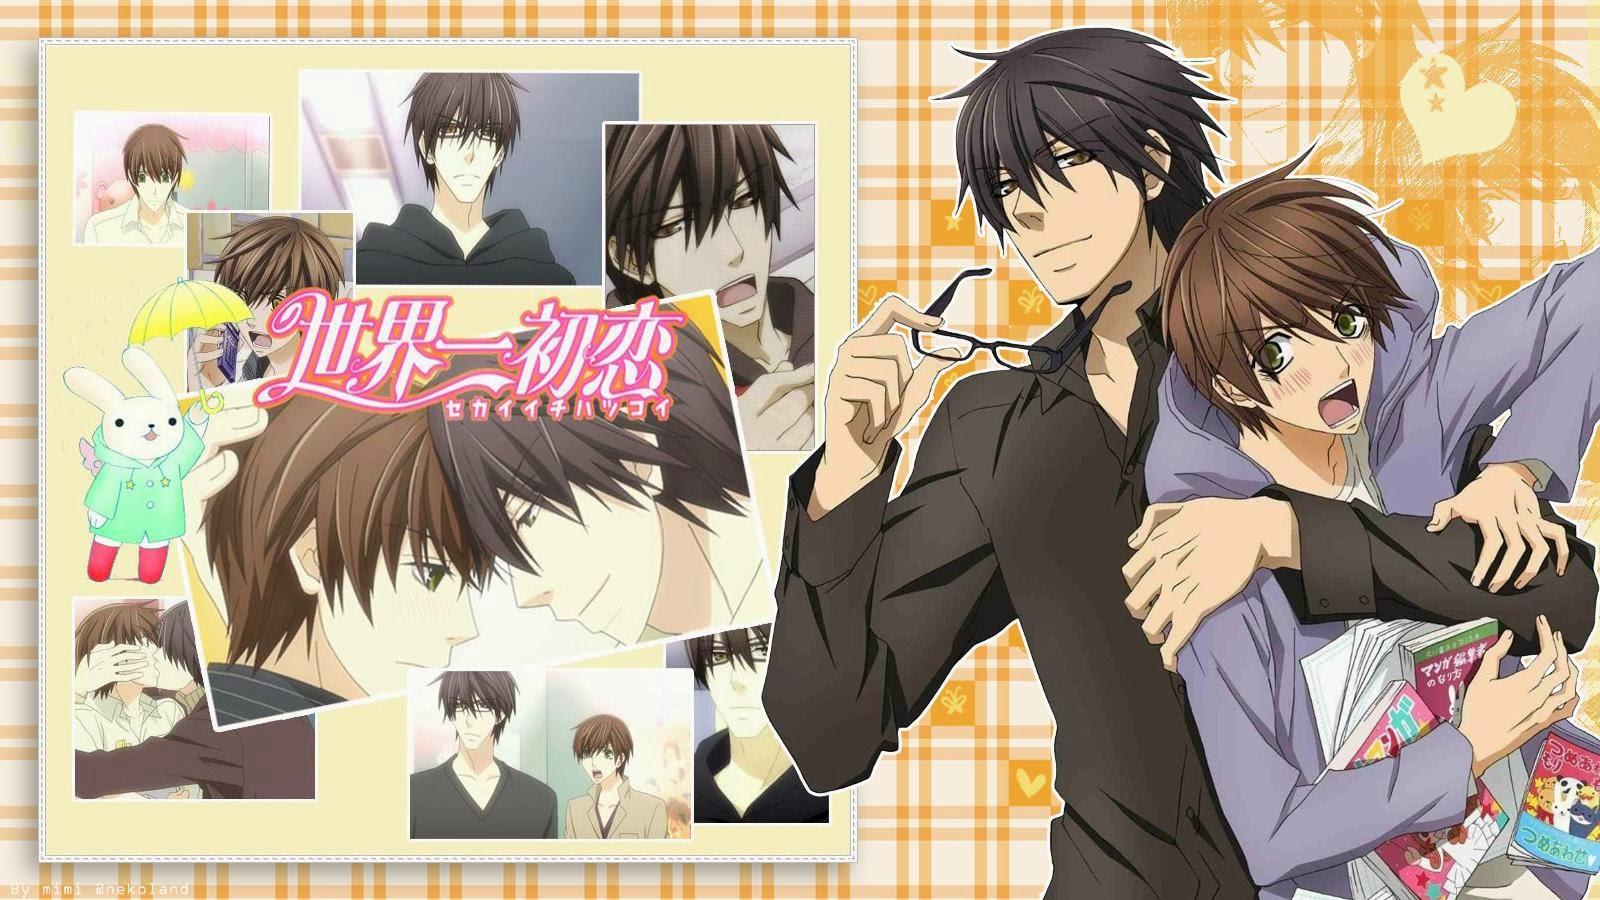 descargar JunJou Romantica 3 Descargar [12/12]+ ovas Mega ...